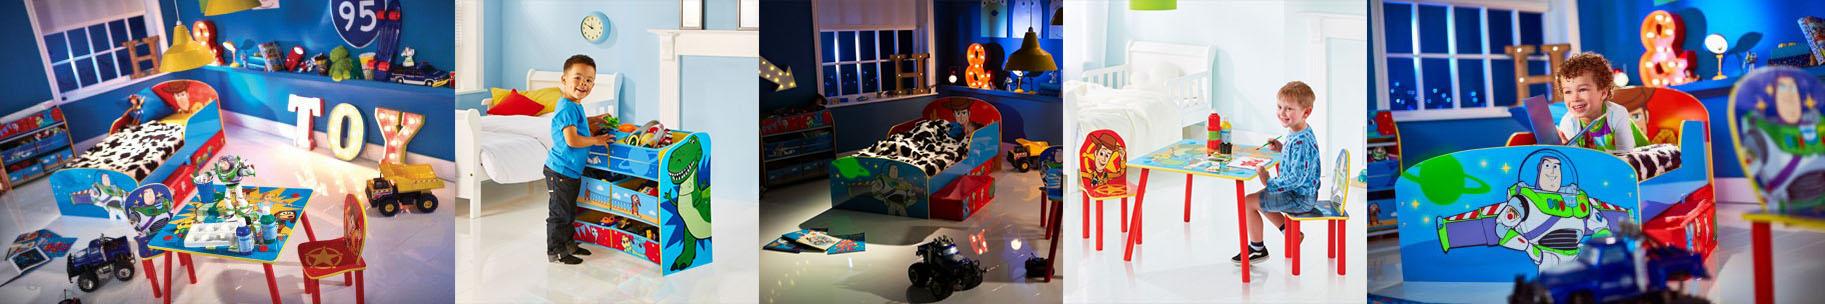 Mobiliario infantil Toy Story Bainba.